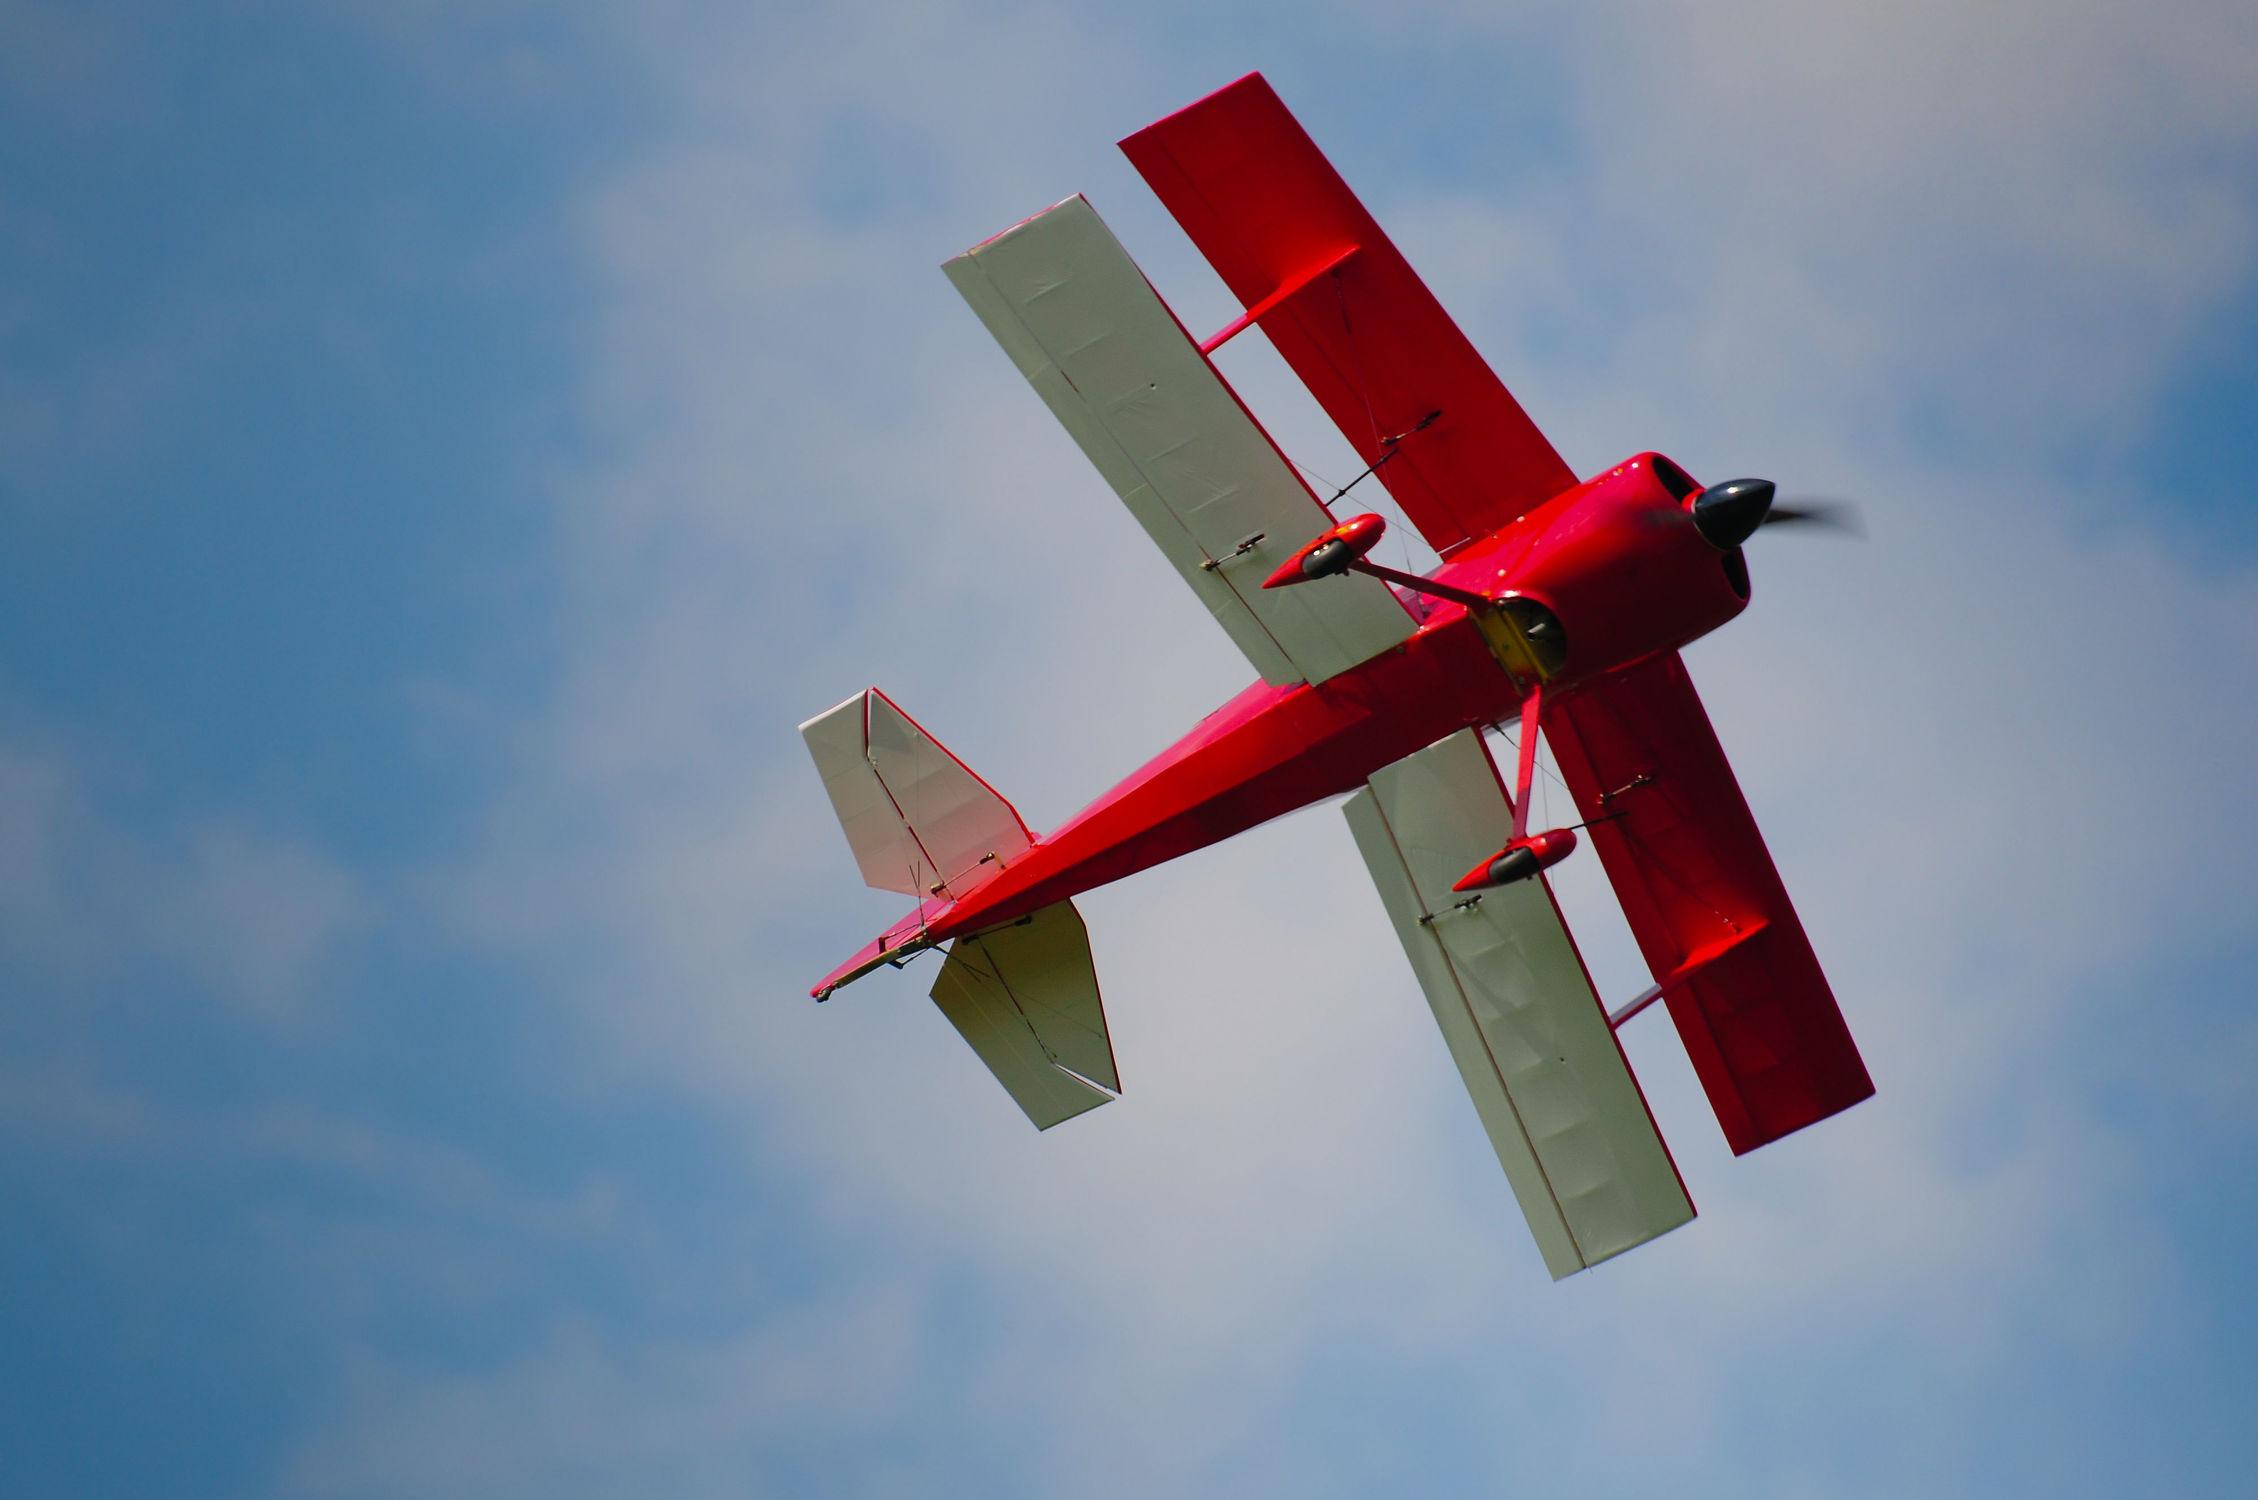 Bild mit Fliegen, Flugzeuge, Abflug, Flugzeug, Jet, Flug